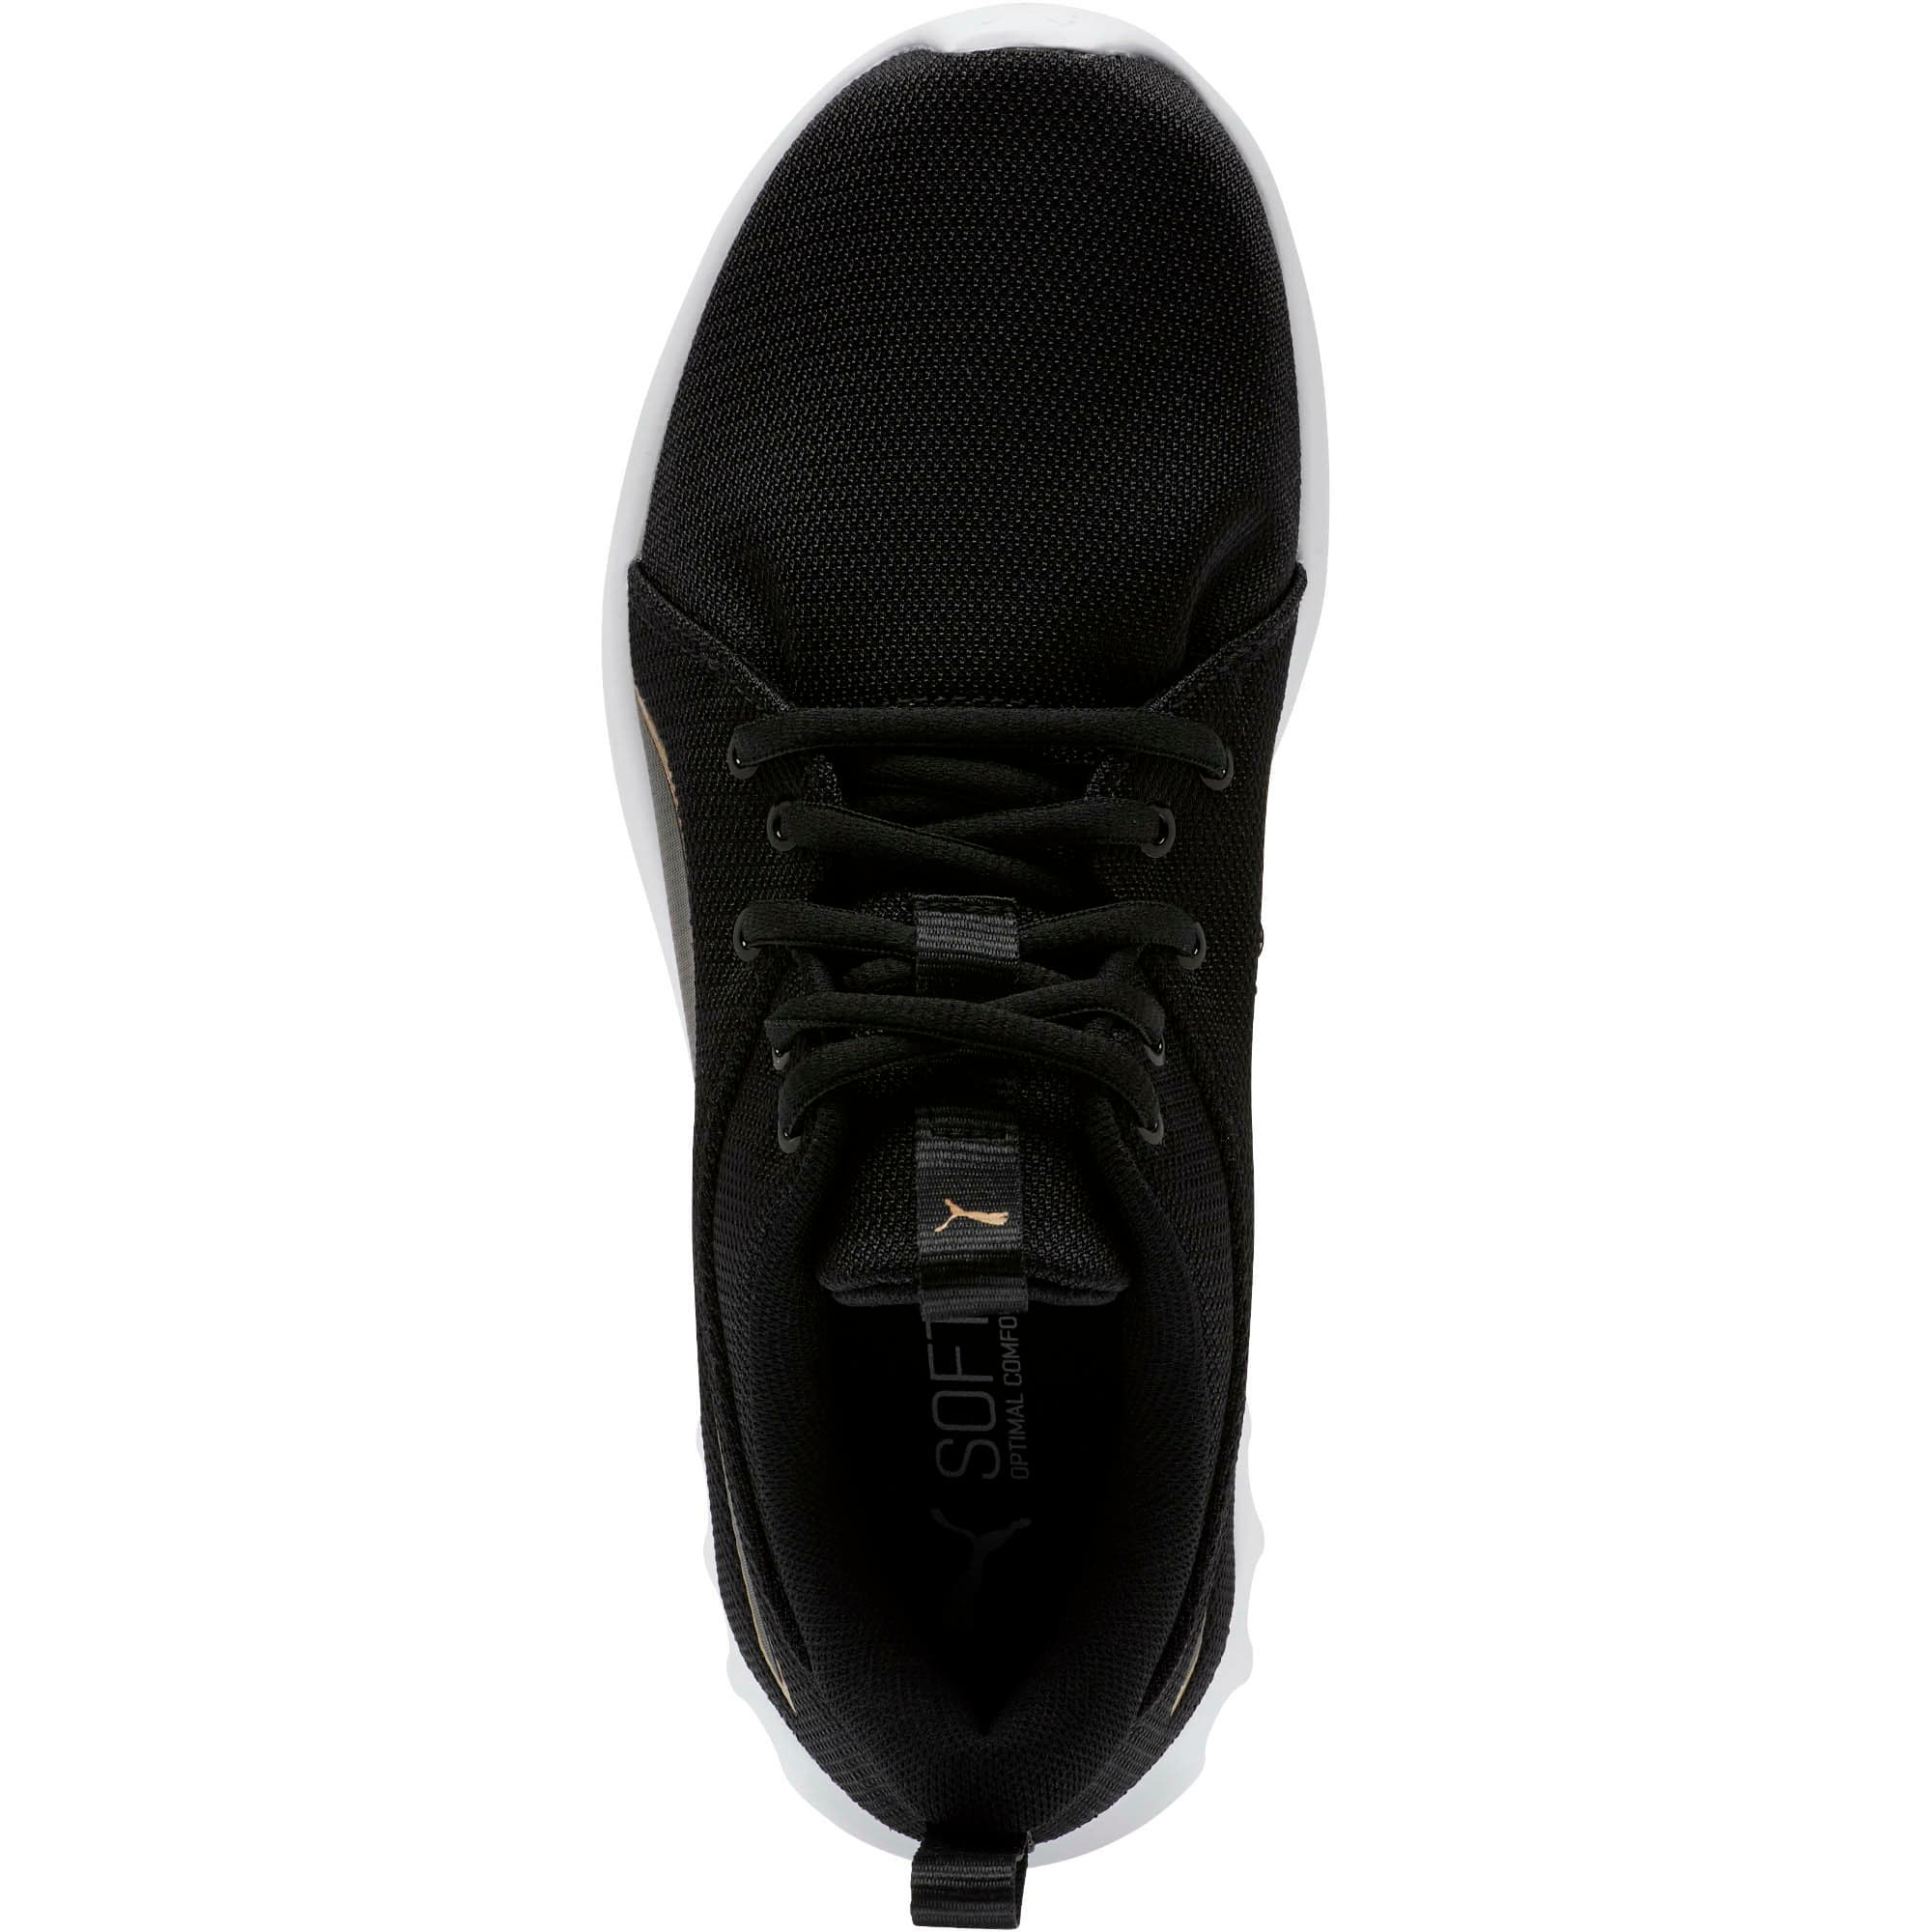 Thumbnail 5 of Carson 2 Cosmo Women's Running Shoes, Puma Black-Metallic Gold, medium